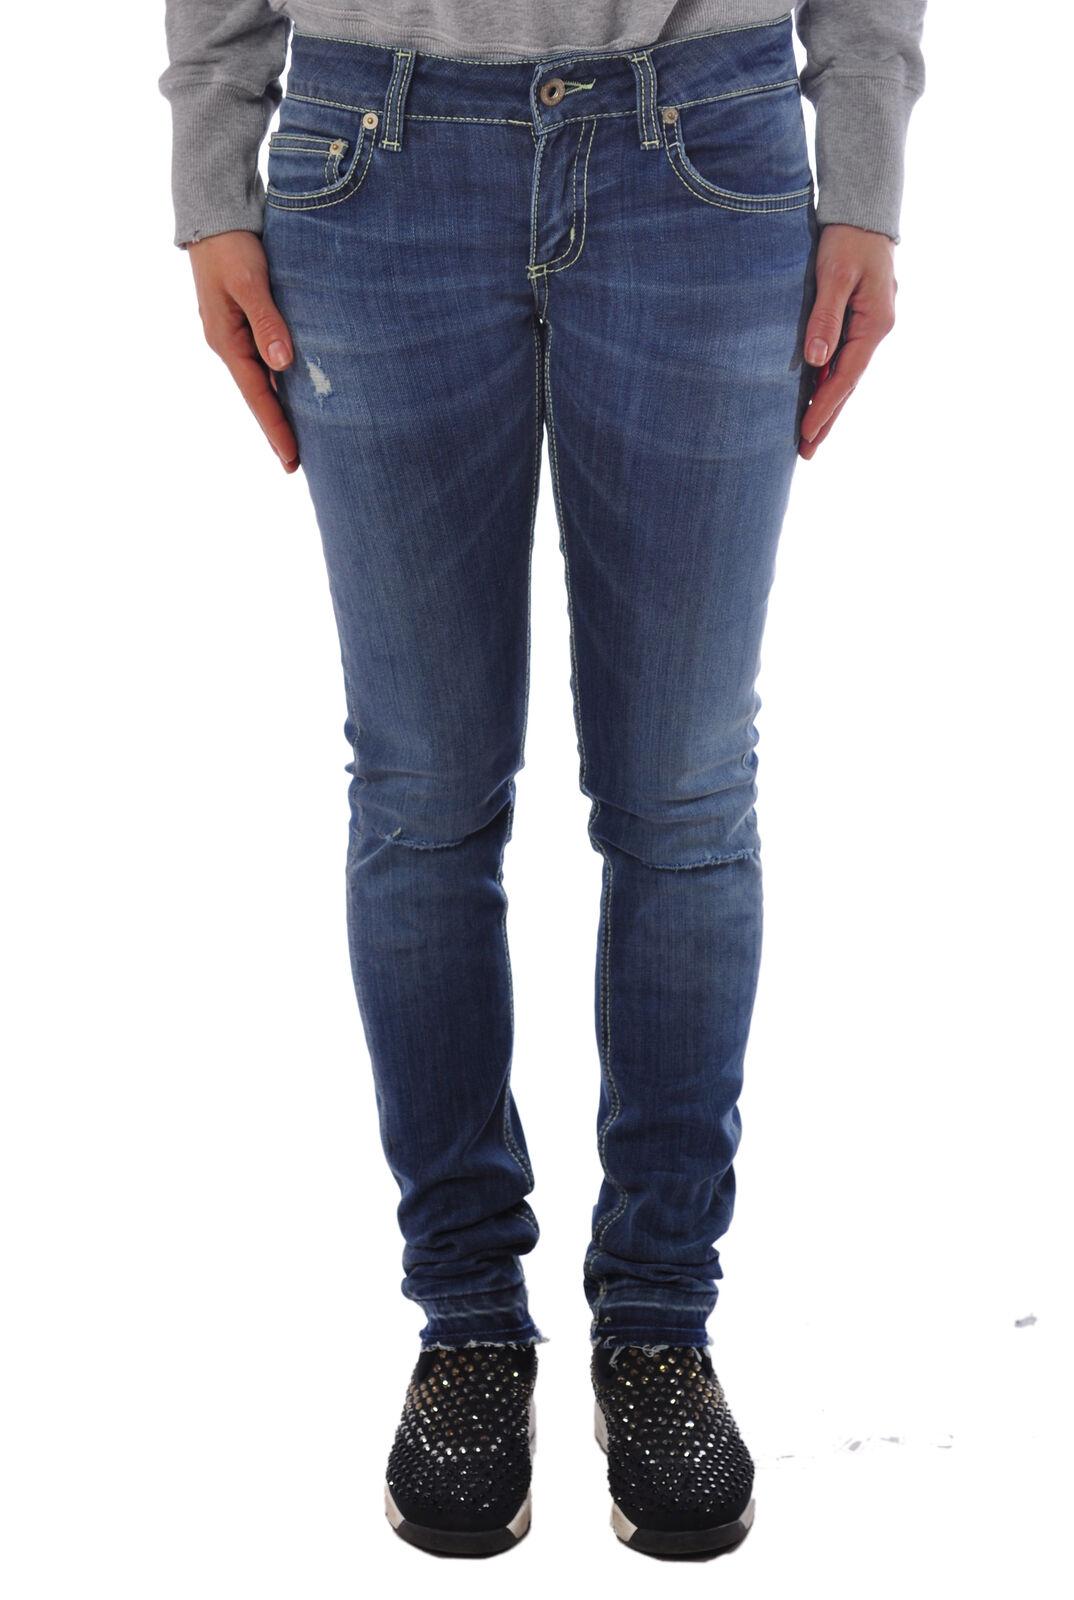 Dondup  -  Pants - Female - Denim - 1317910A184237